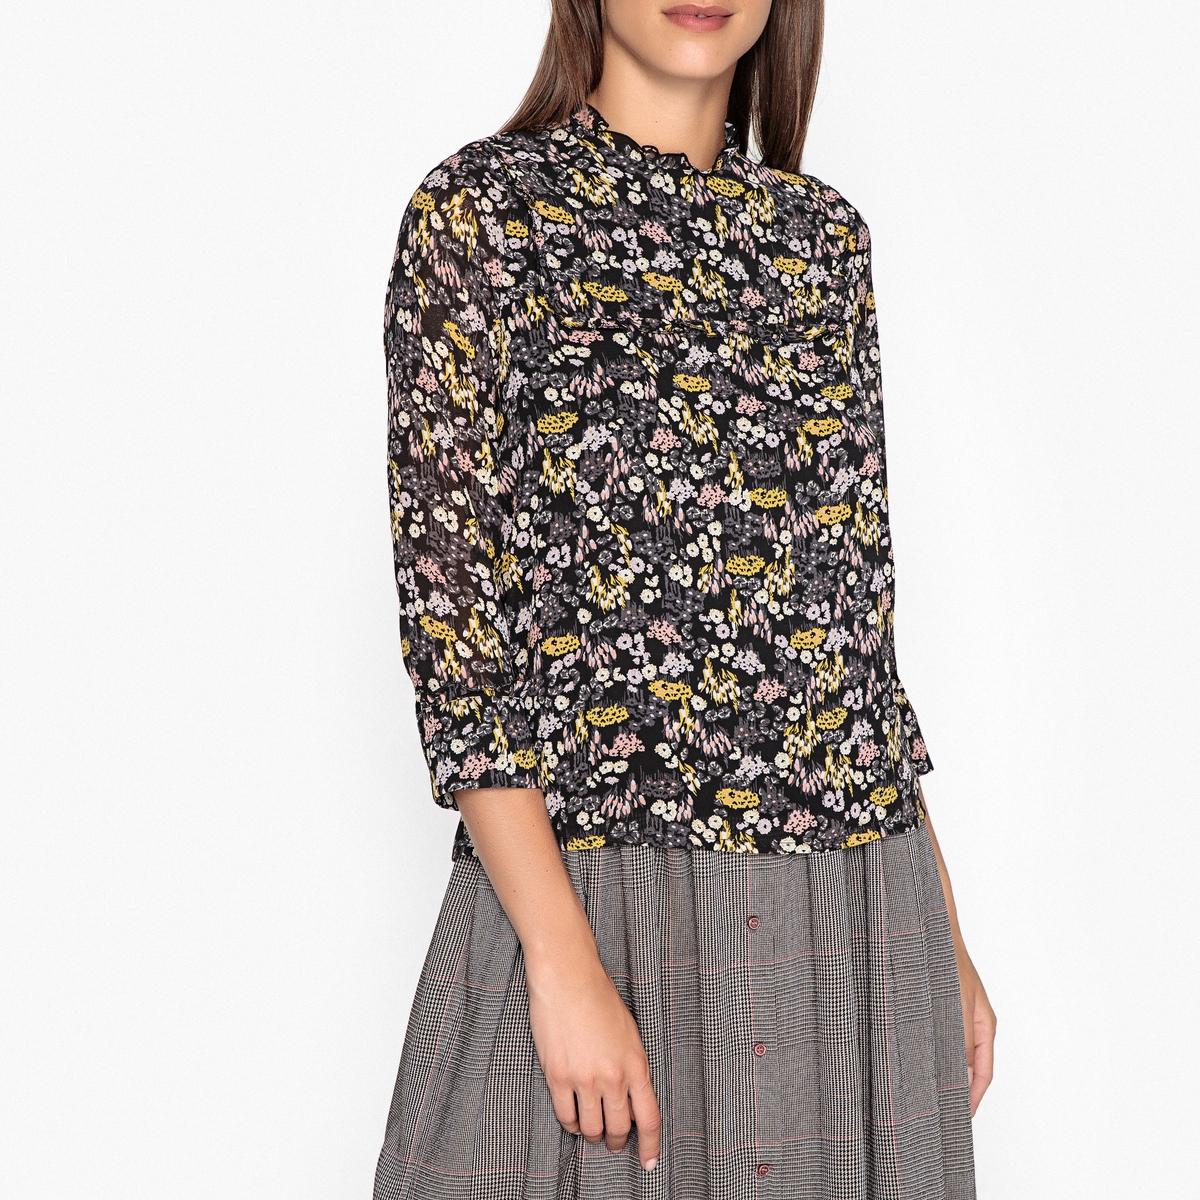 Блузка из муслина с принтом ASHLEY удлиненная блузка quelle ashley brooke by heine 35260